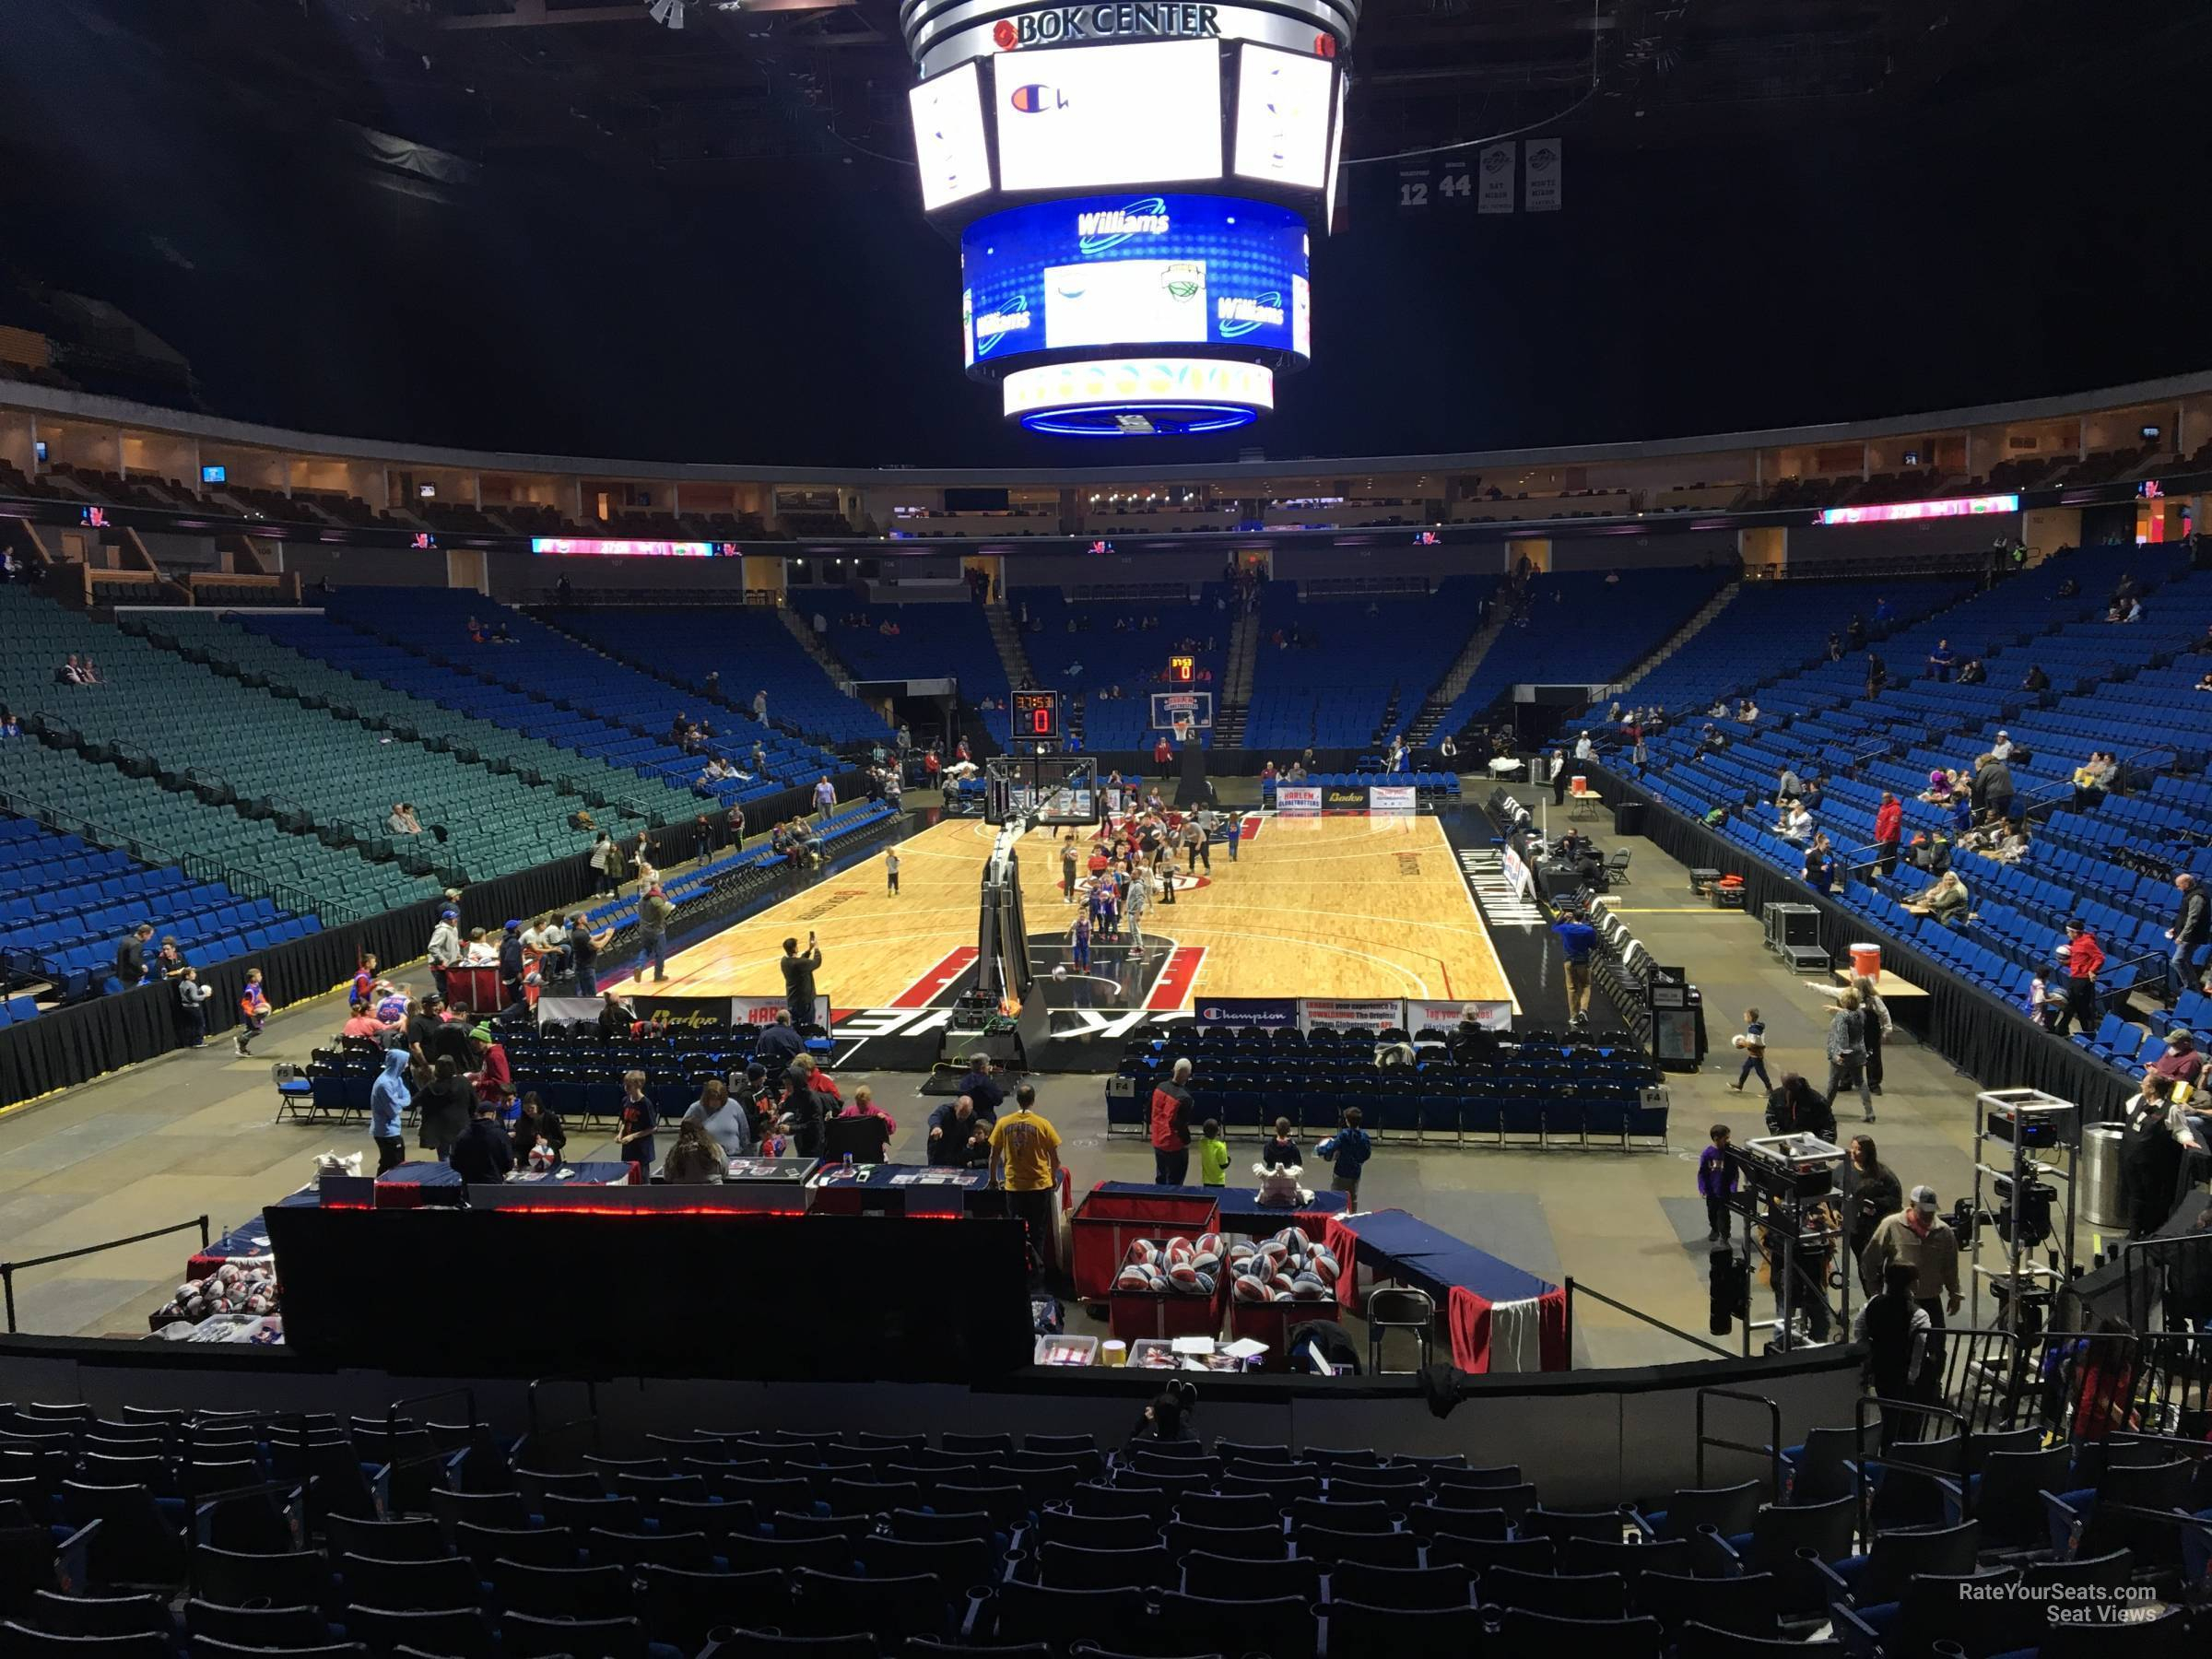 Bok Center Section 116 Basketball Seating  Rateyourseats with Bok Center Seating Chart With Numbers